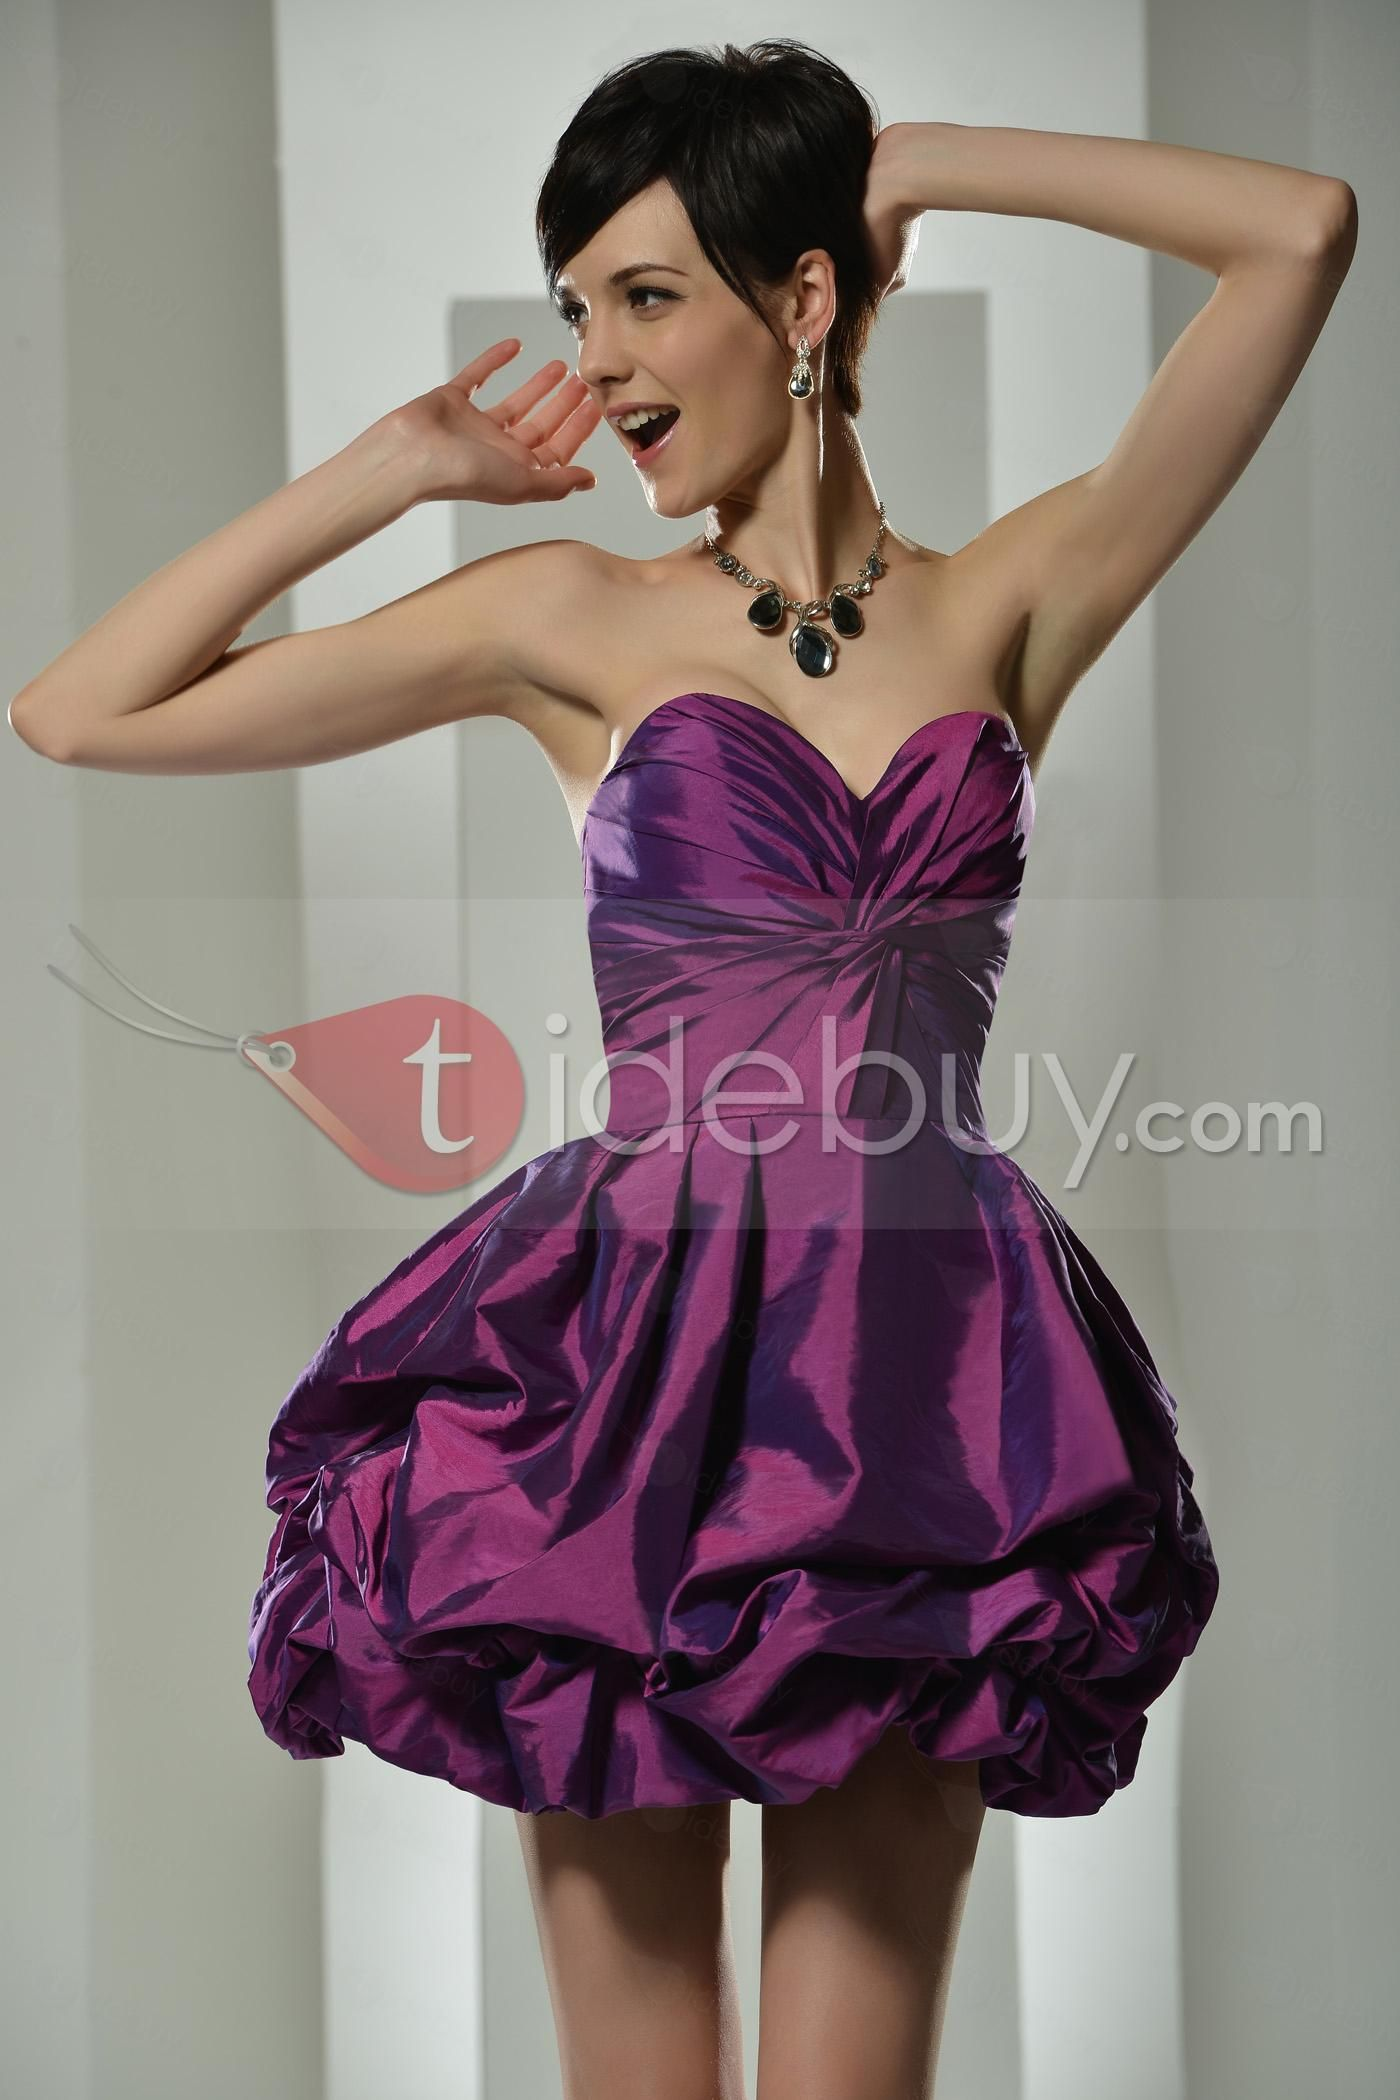 Encantador Vestido De Cóctel En Línea Ideas Ornamento Elaboración ...